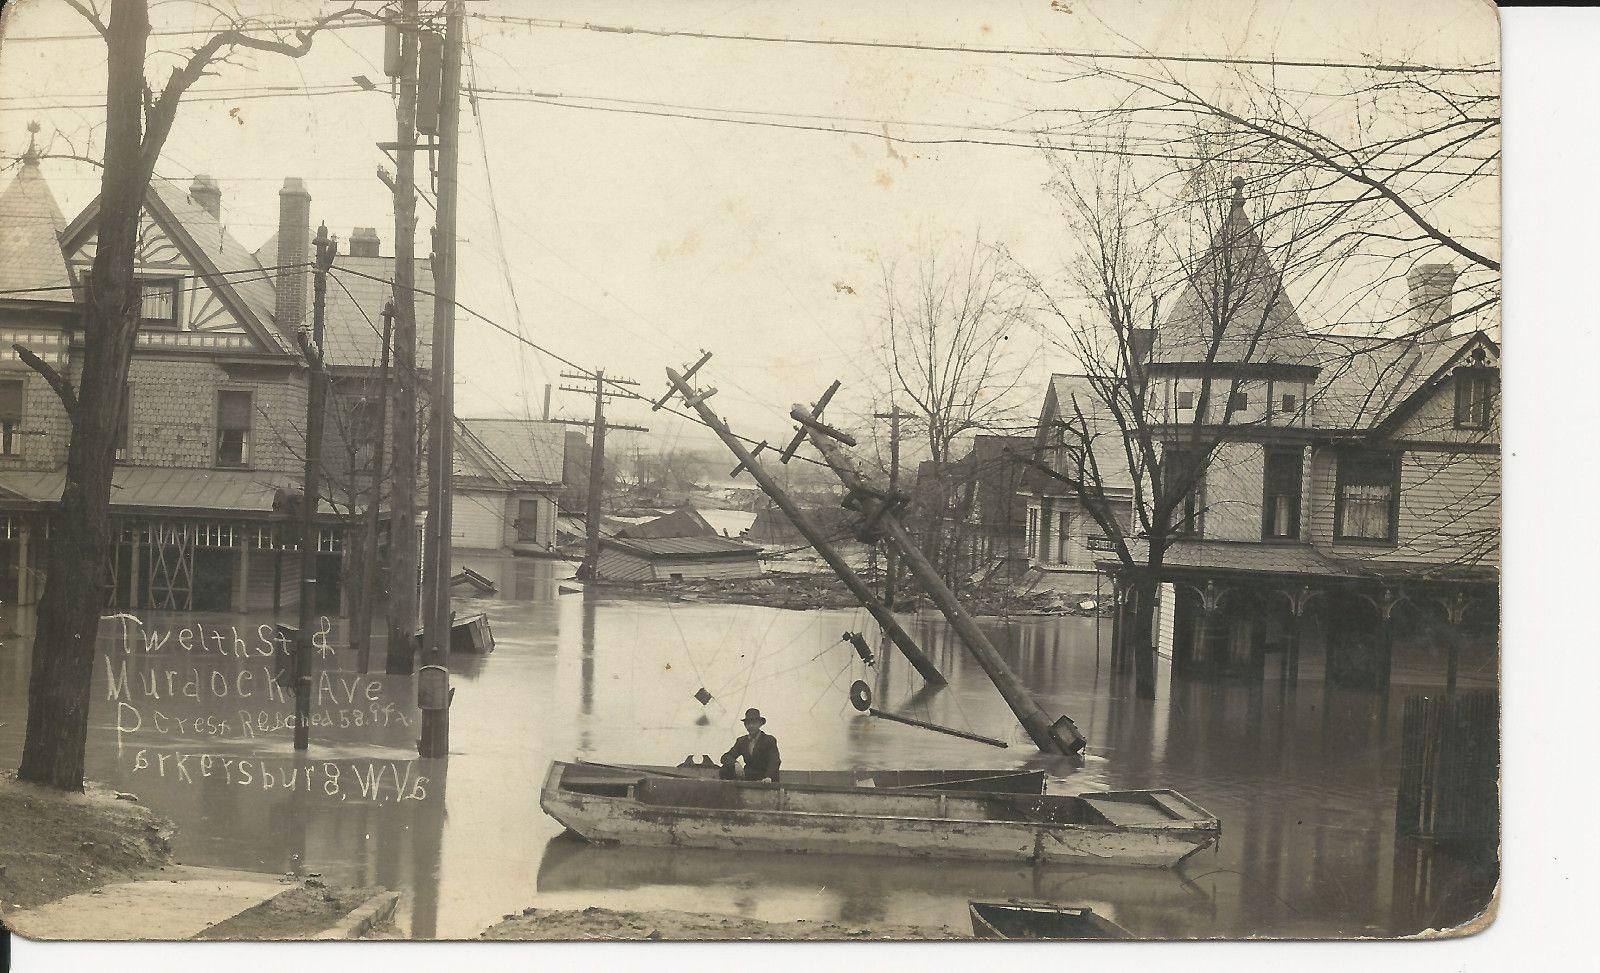 Parkersburg Wv Flood 1913 12th St Murdoch Ave Real Photo 1913 West Virginia History Parkersburg Parkersburg Wv